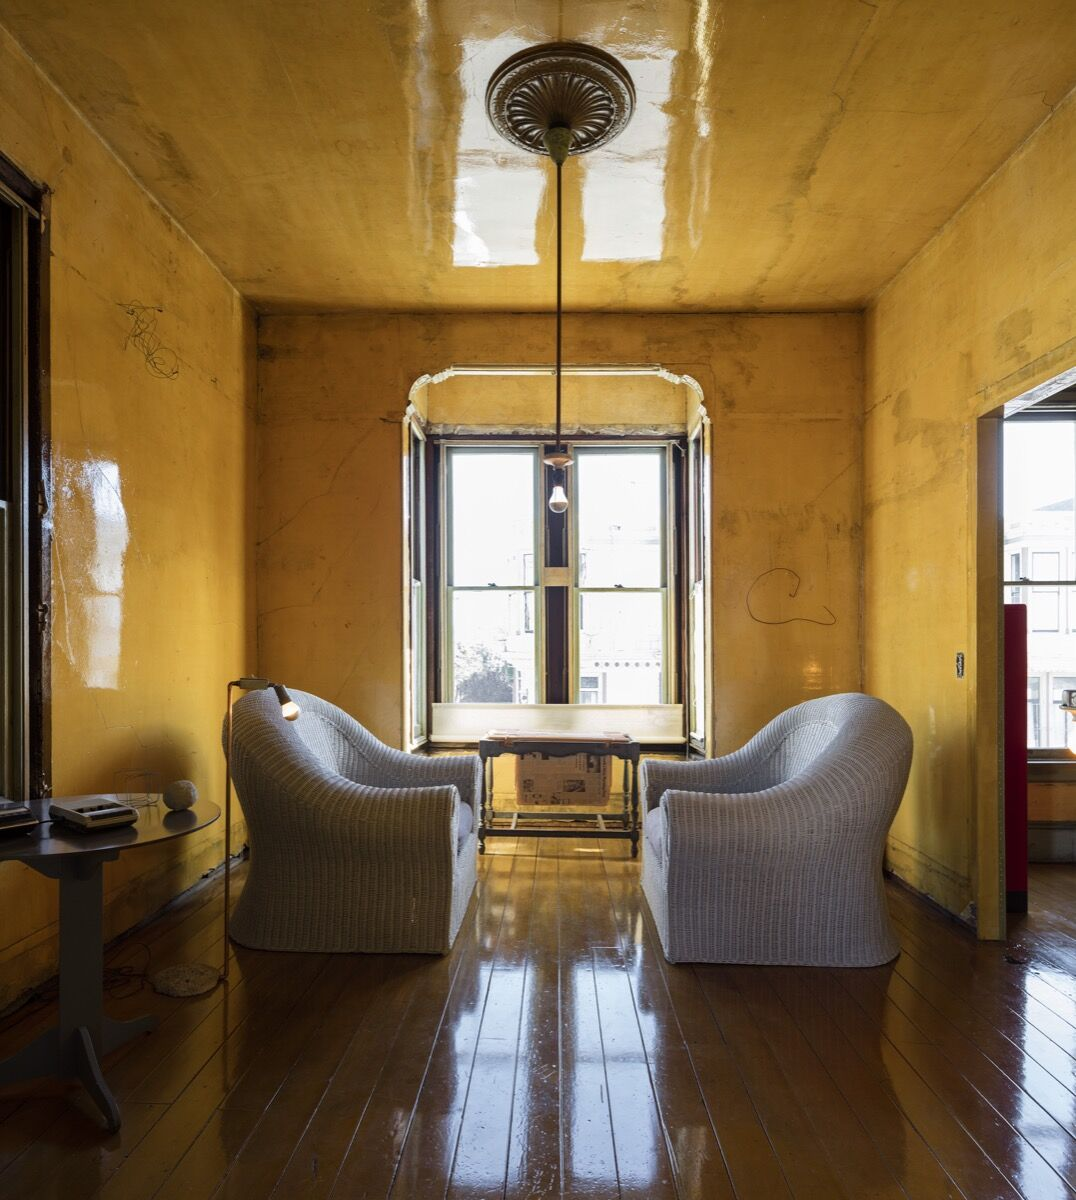 The David Ireland House. Photo by Henrik Kam. Courtesy of The 500 Cap Street Foundation.